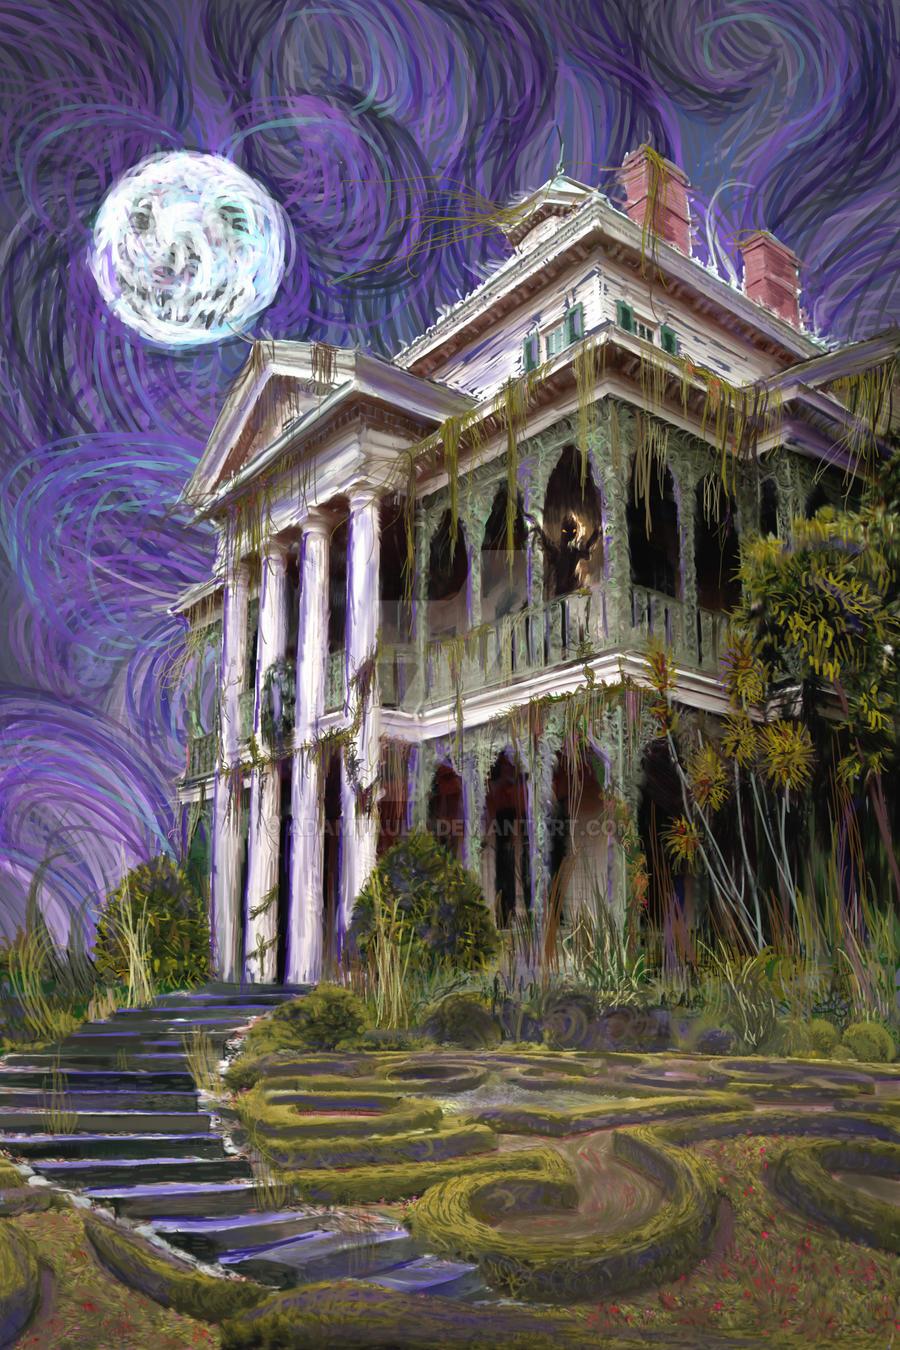 The Haunted Mansion Night